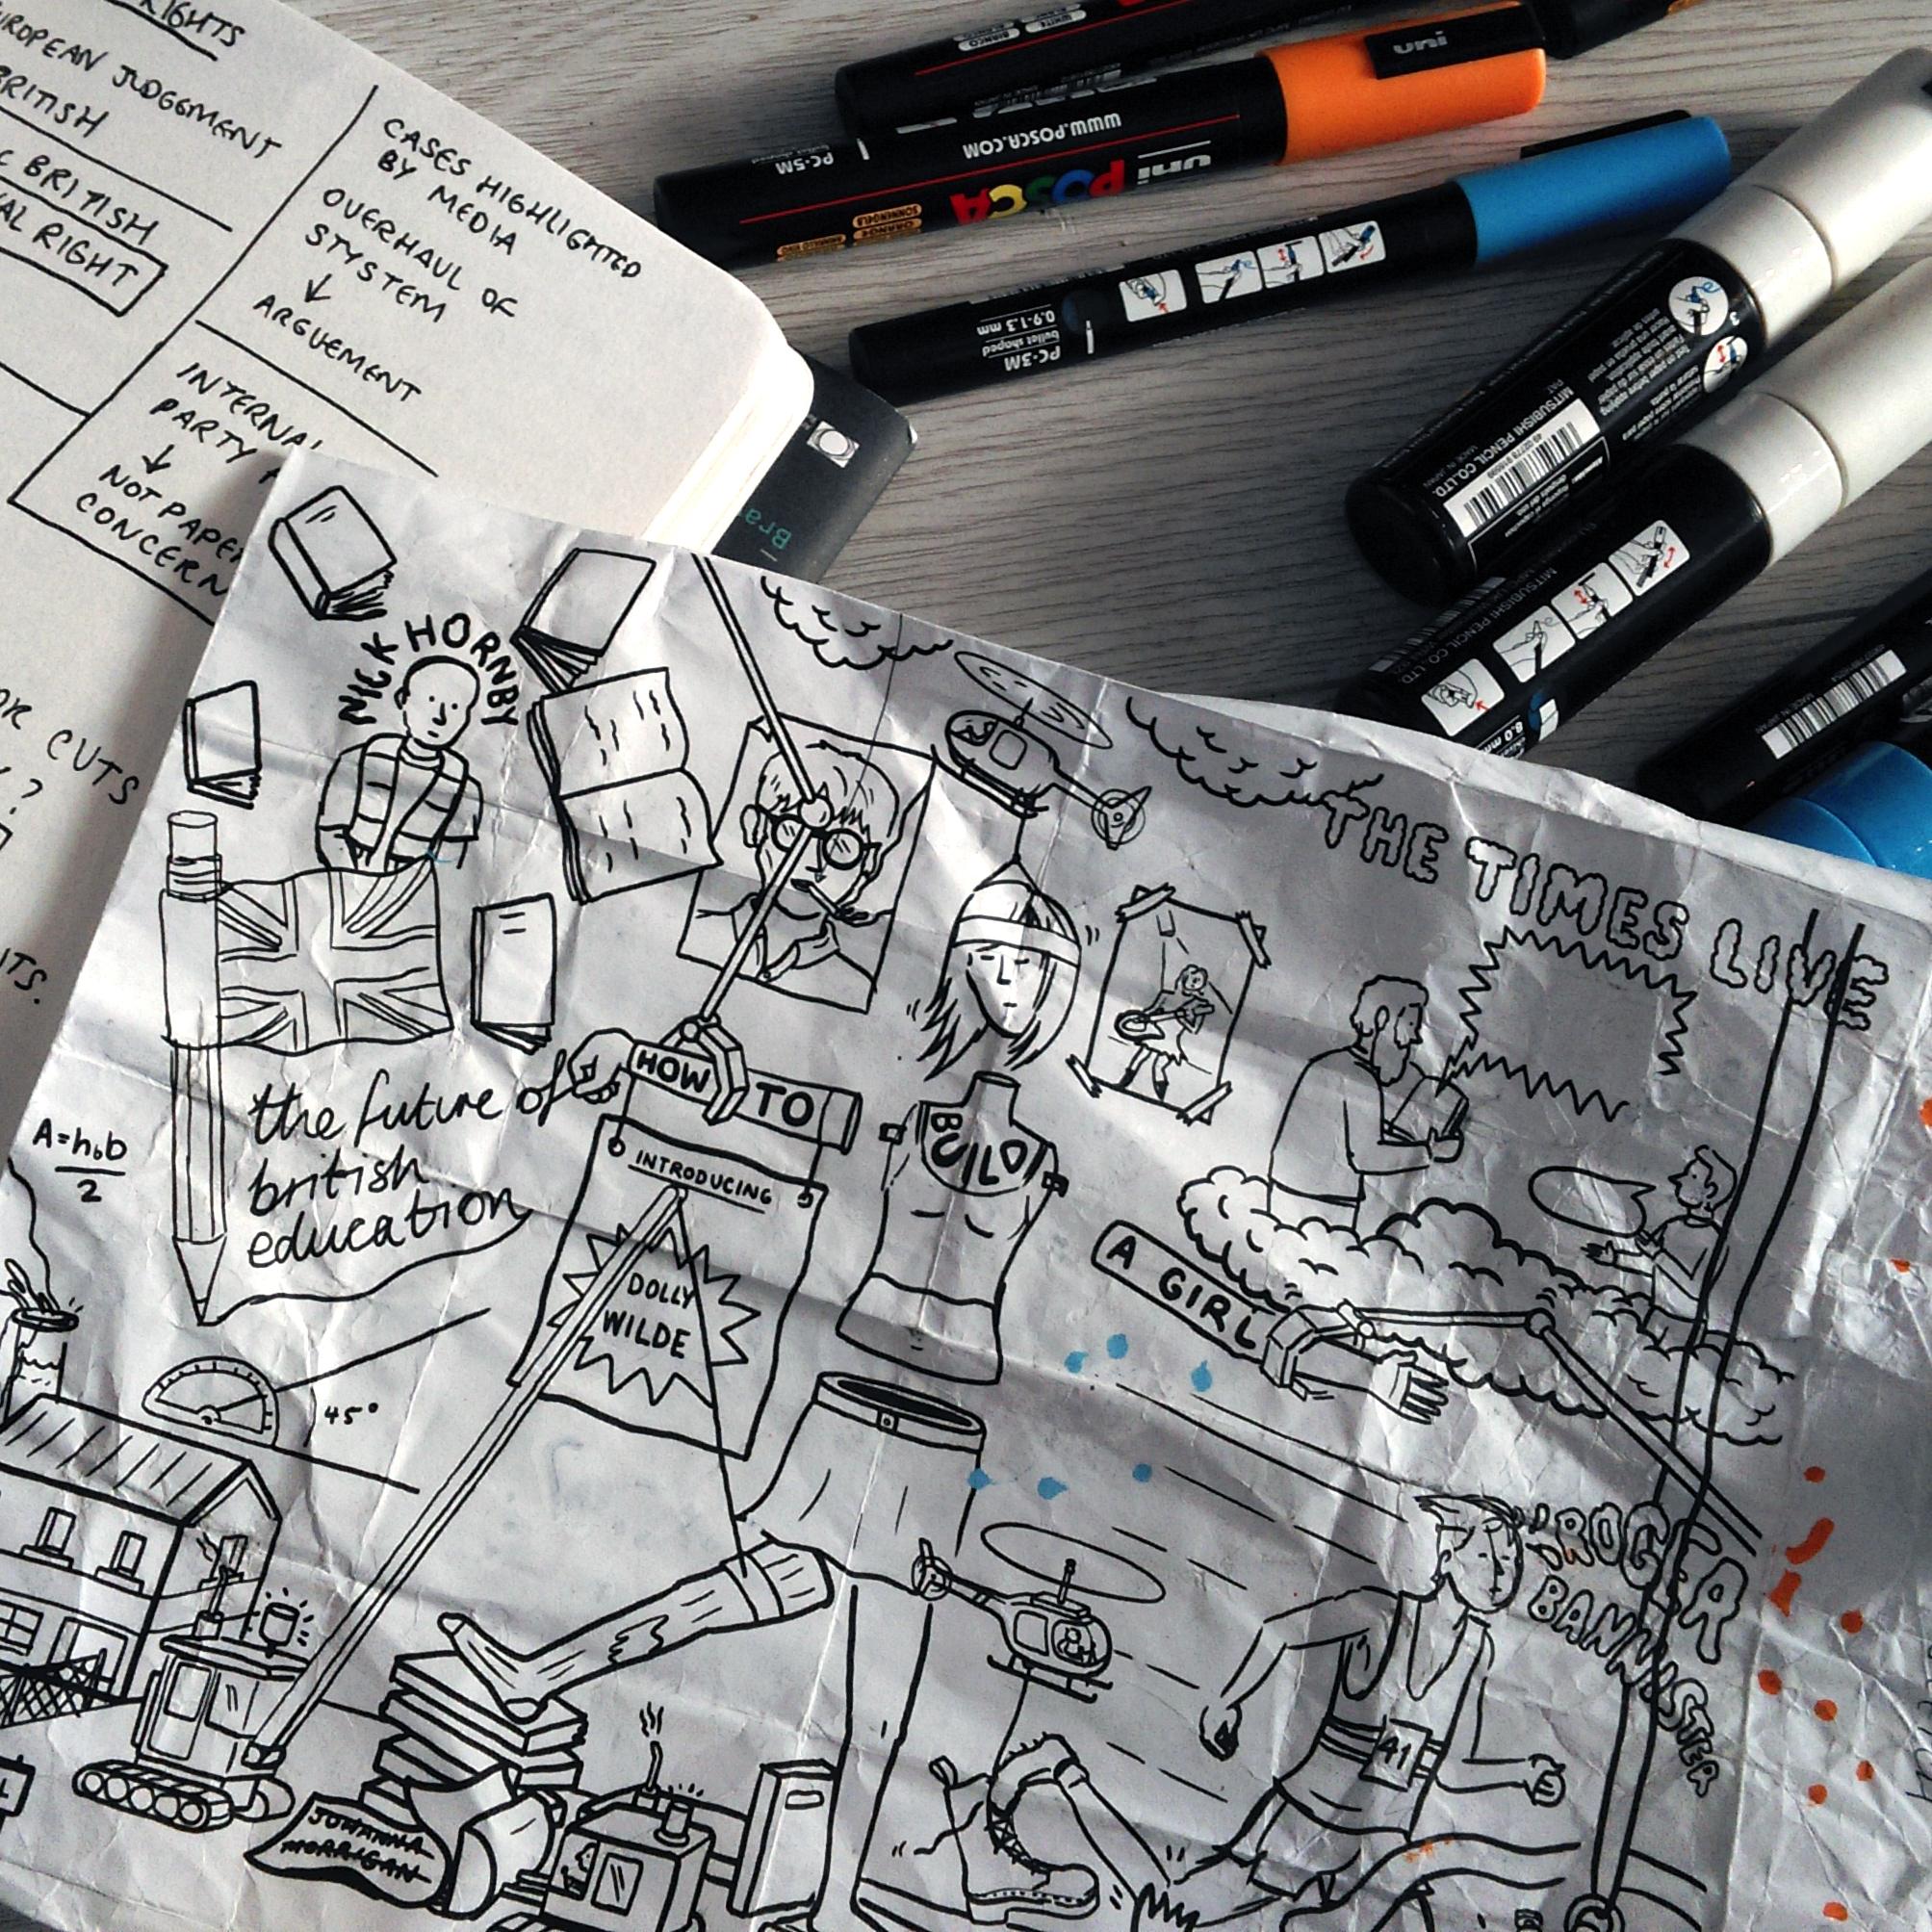 Jelly London Takes Us Behind the Scenes with Illustrator Matt Johnstone